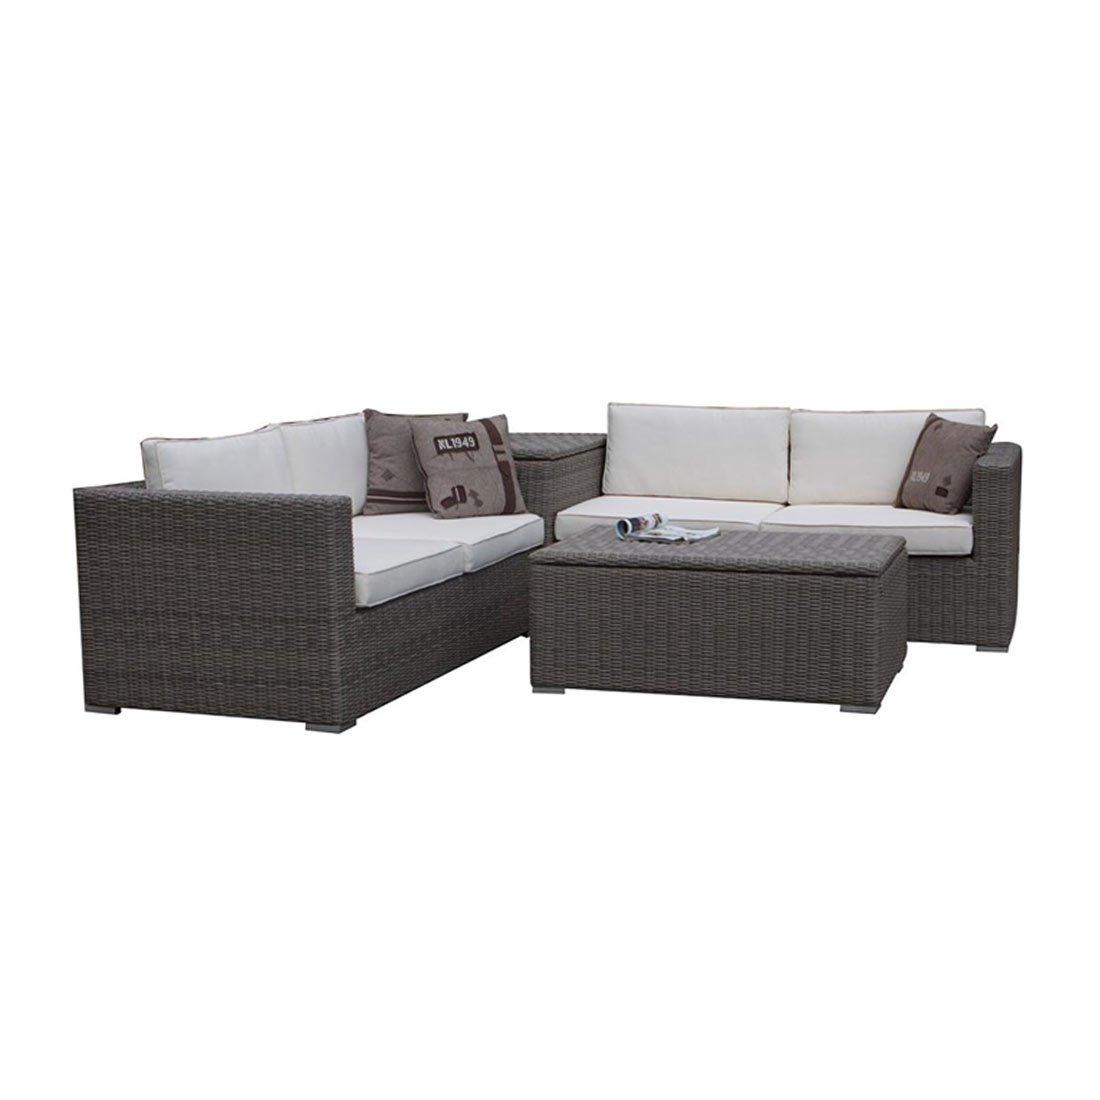 Gartenlounge OUTLIV. Saba Loungegruppe 4-teilig Geflecht grau 712801-806039 jetzt kaufen